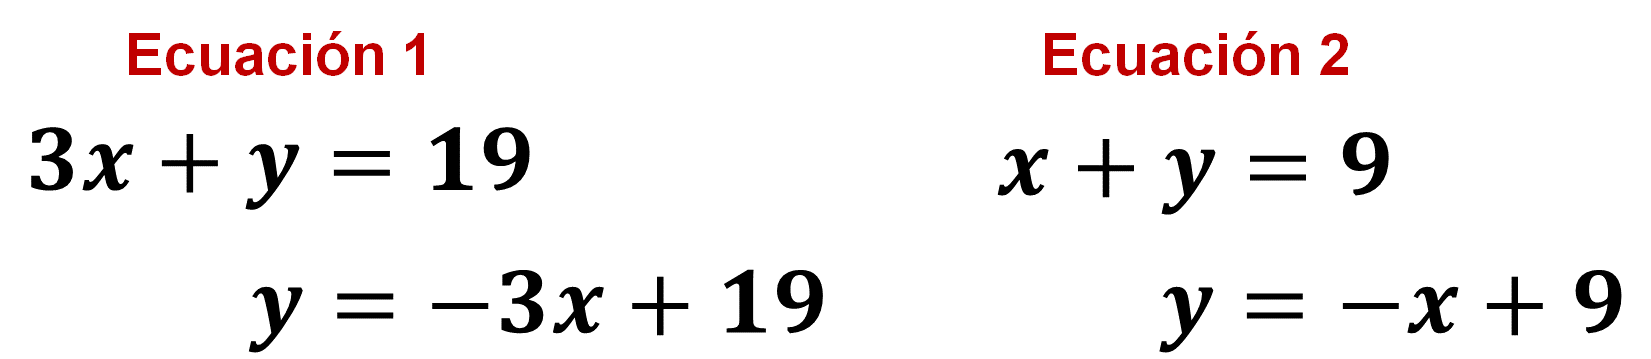 B64 IMG qyuwwDCxMv 3qt3zHzoco